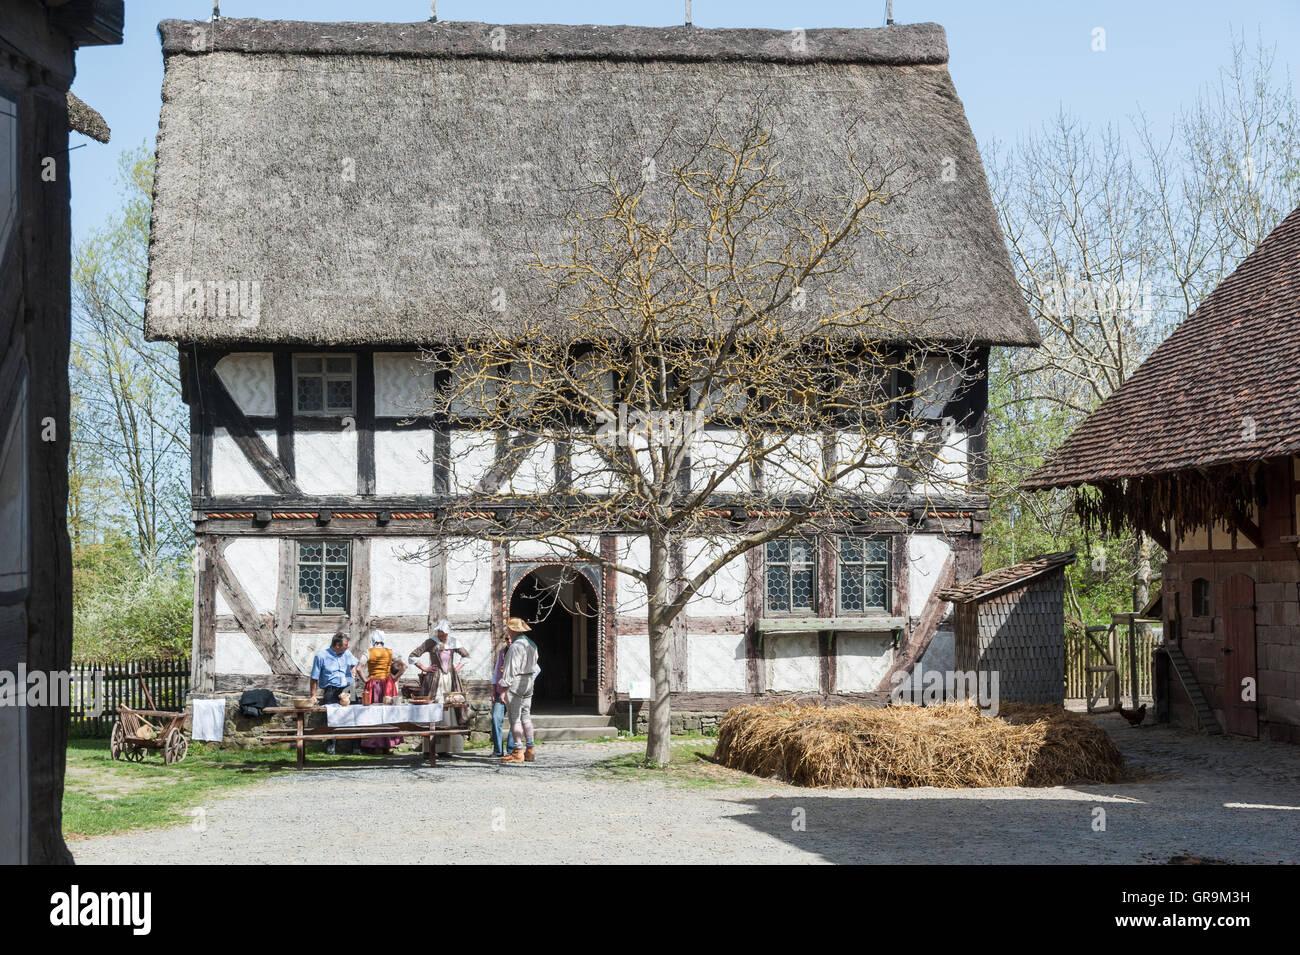 Historic Farmhouse Neu-Anspach Deutschland - Stock Image